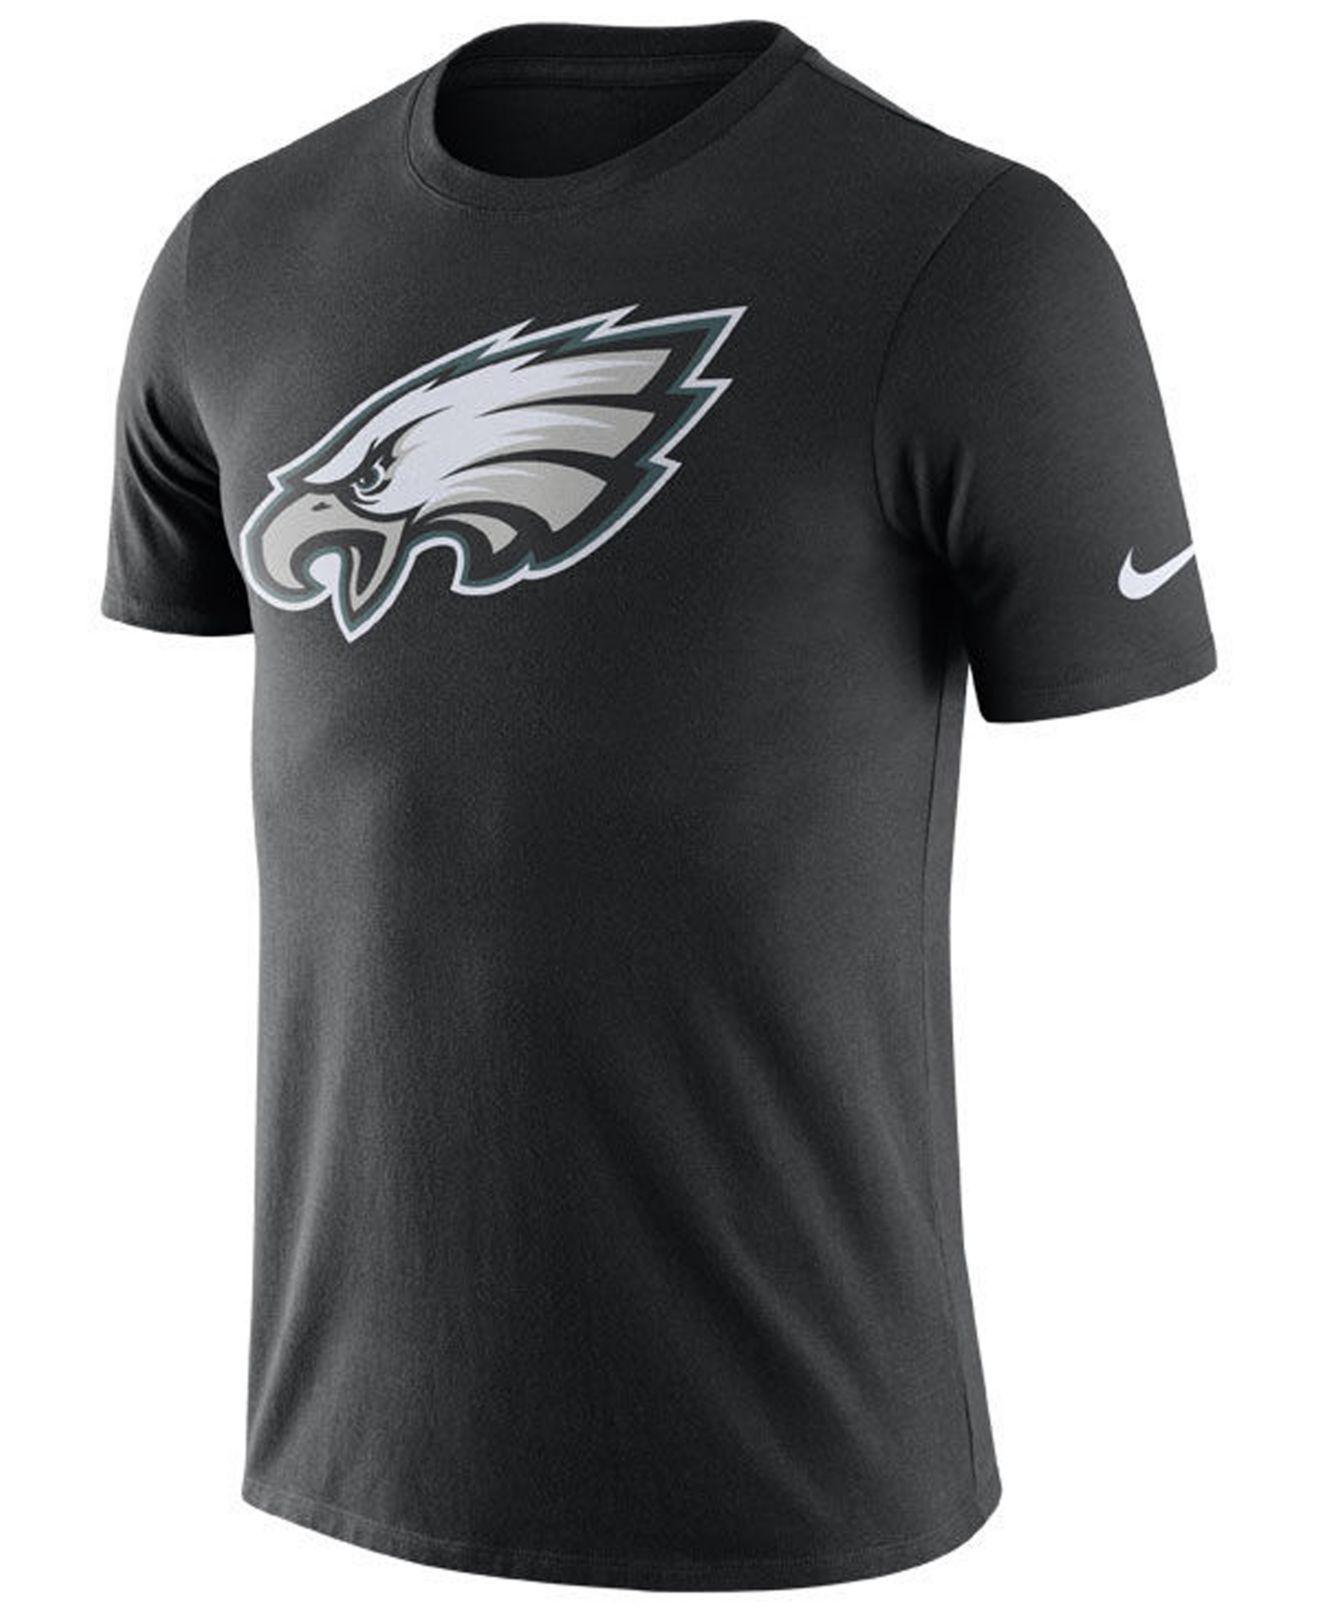 d41e699f Lyst - Nike Philadelphia Eagles Dri-fit Cotton Essential Logo T ...